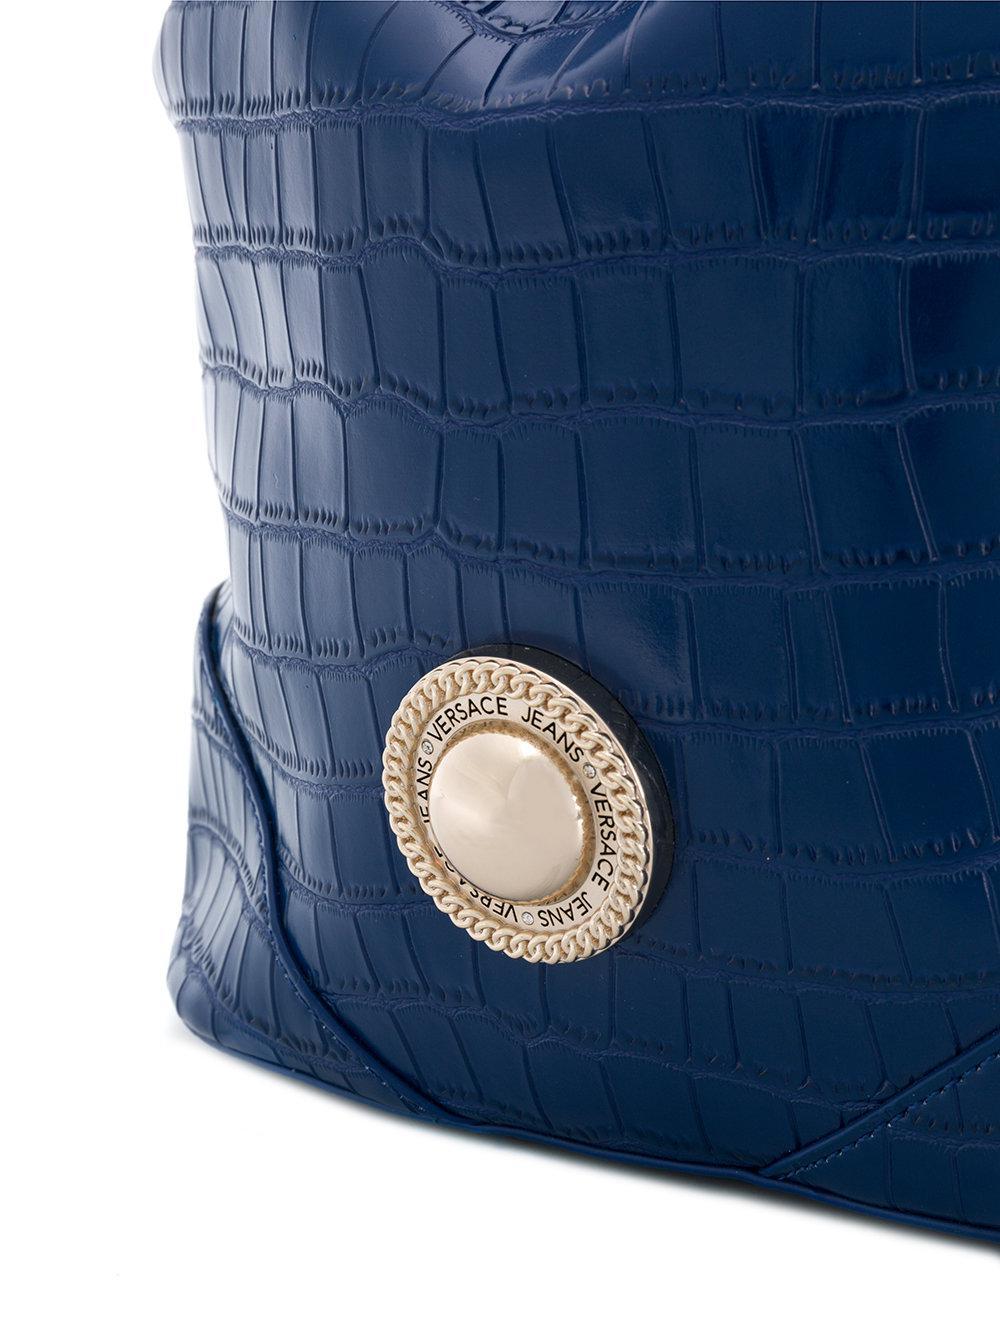 Versace Jeans Croco Embossed Bucket Bag in Blue - Lyst e9a4dd3469